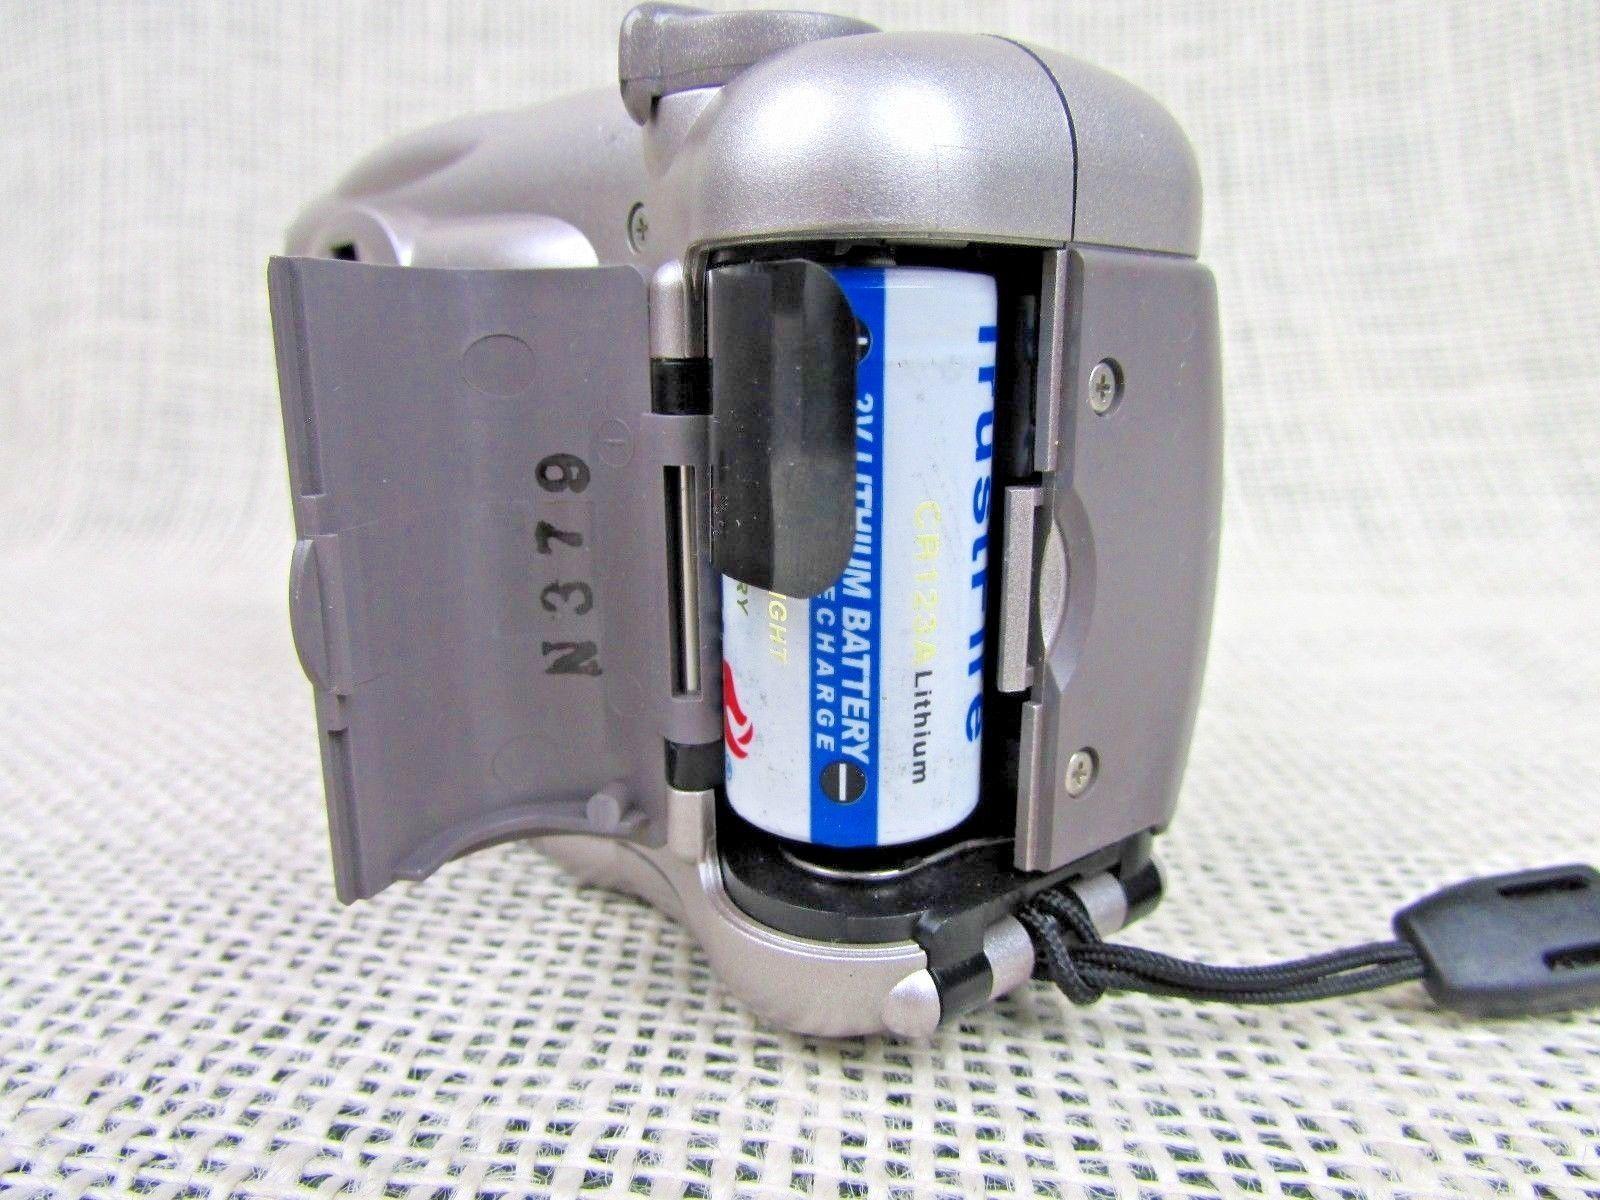 KODAK Advantix C700 Film Advanced Photo System Camera With Case